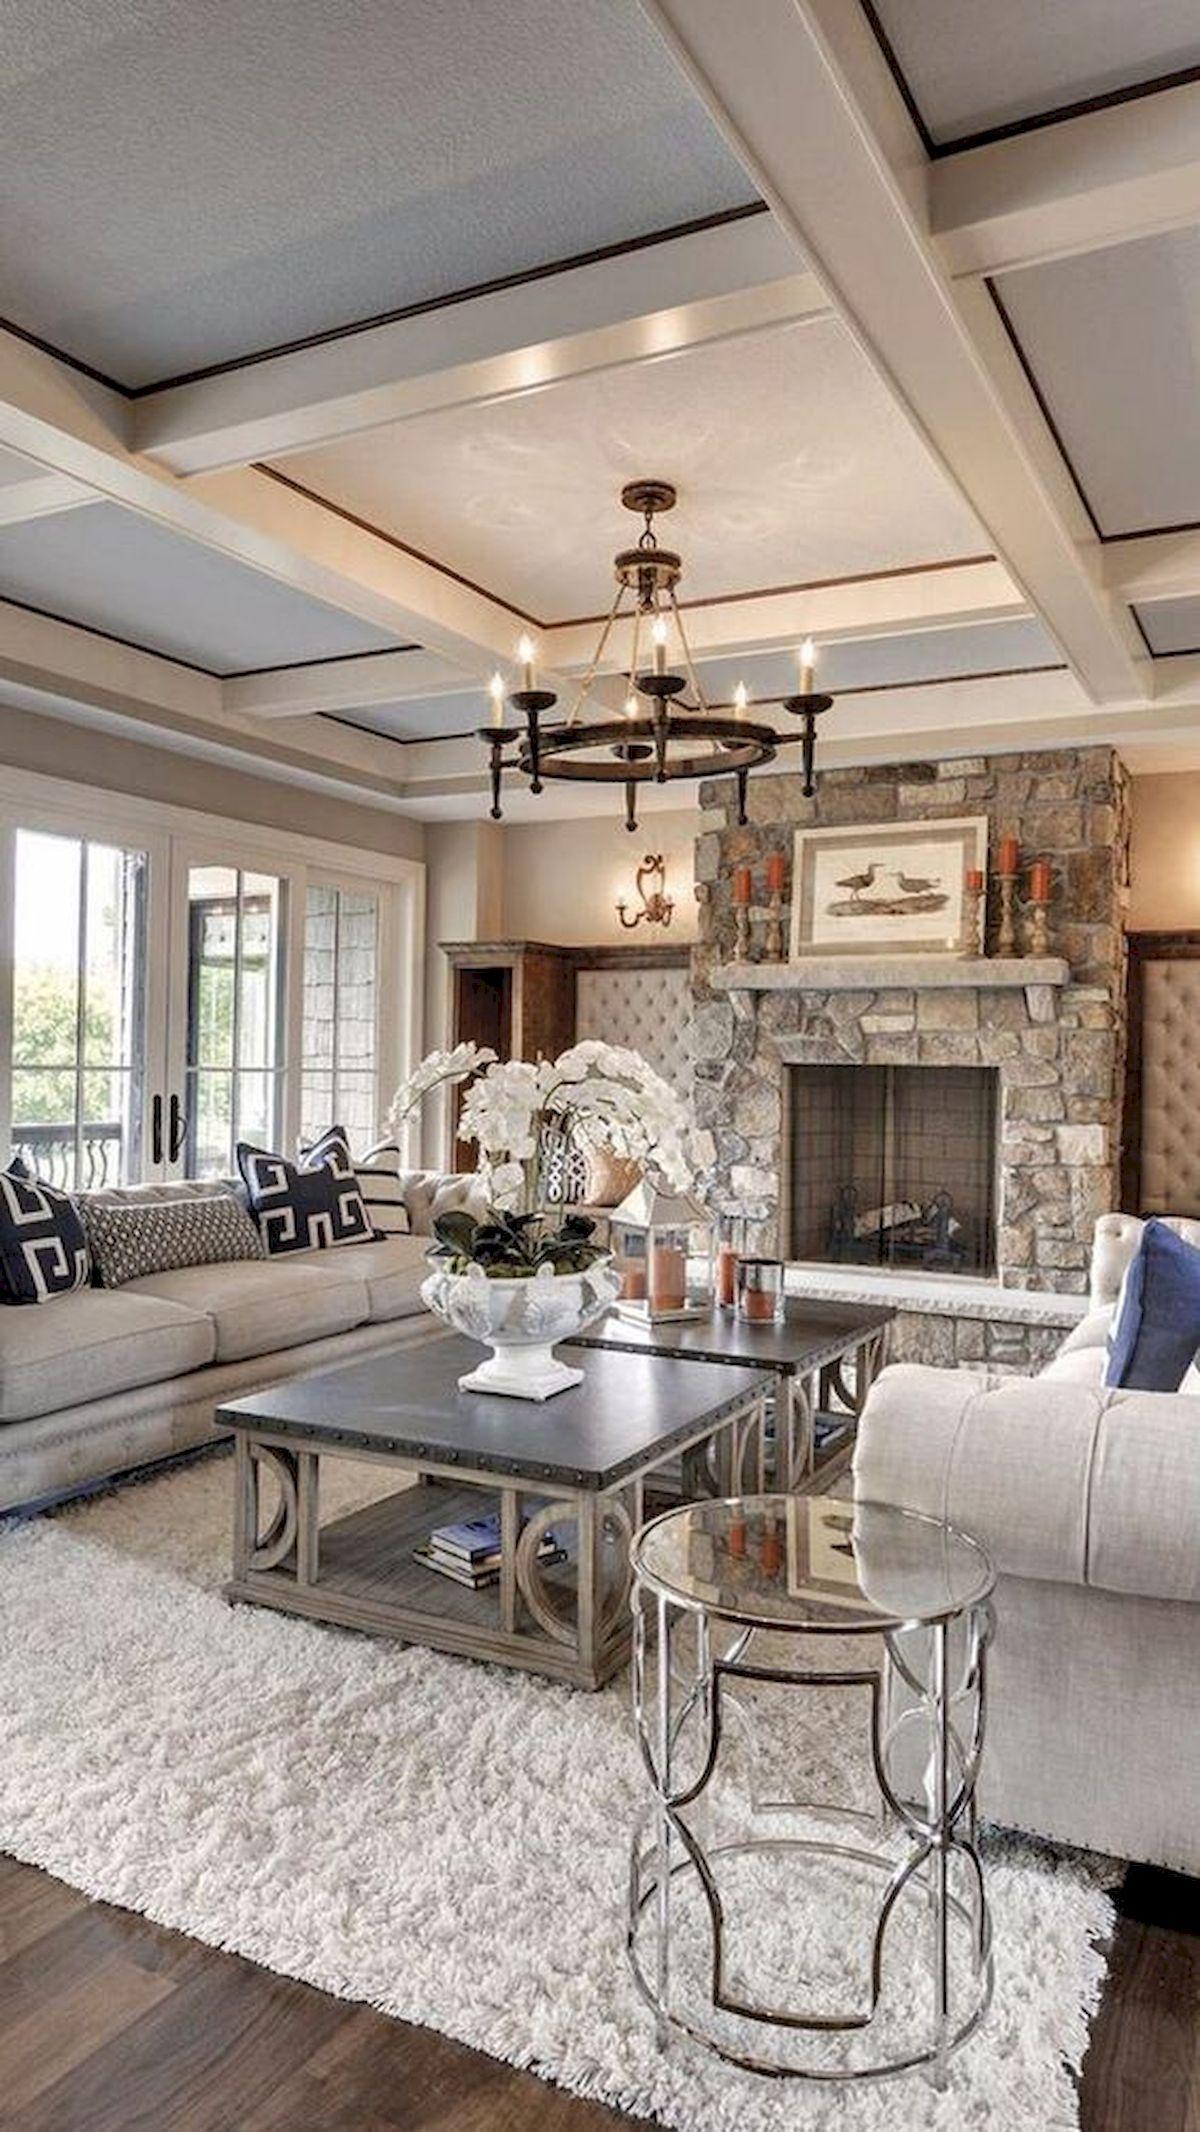 50 Gorgeous Living Room Decor and Design Ideas (10)